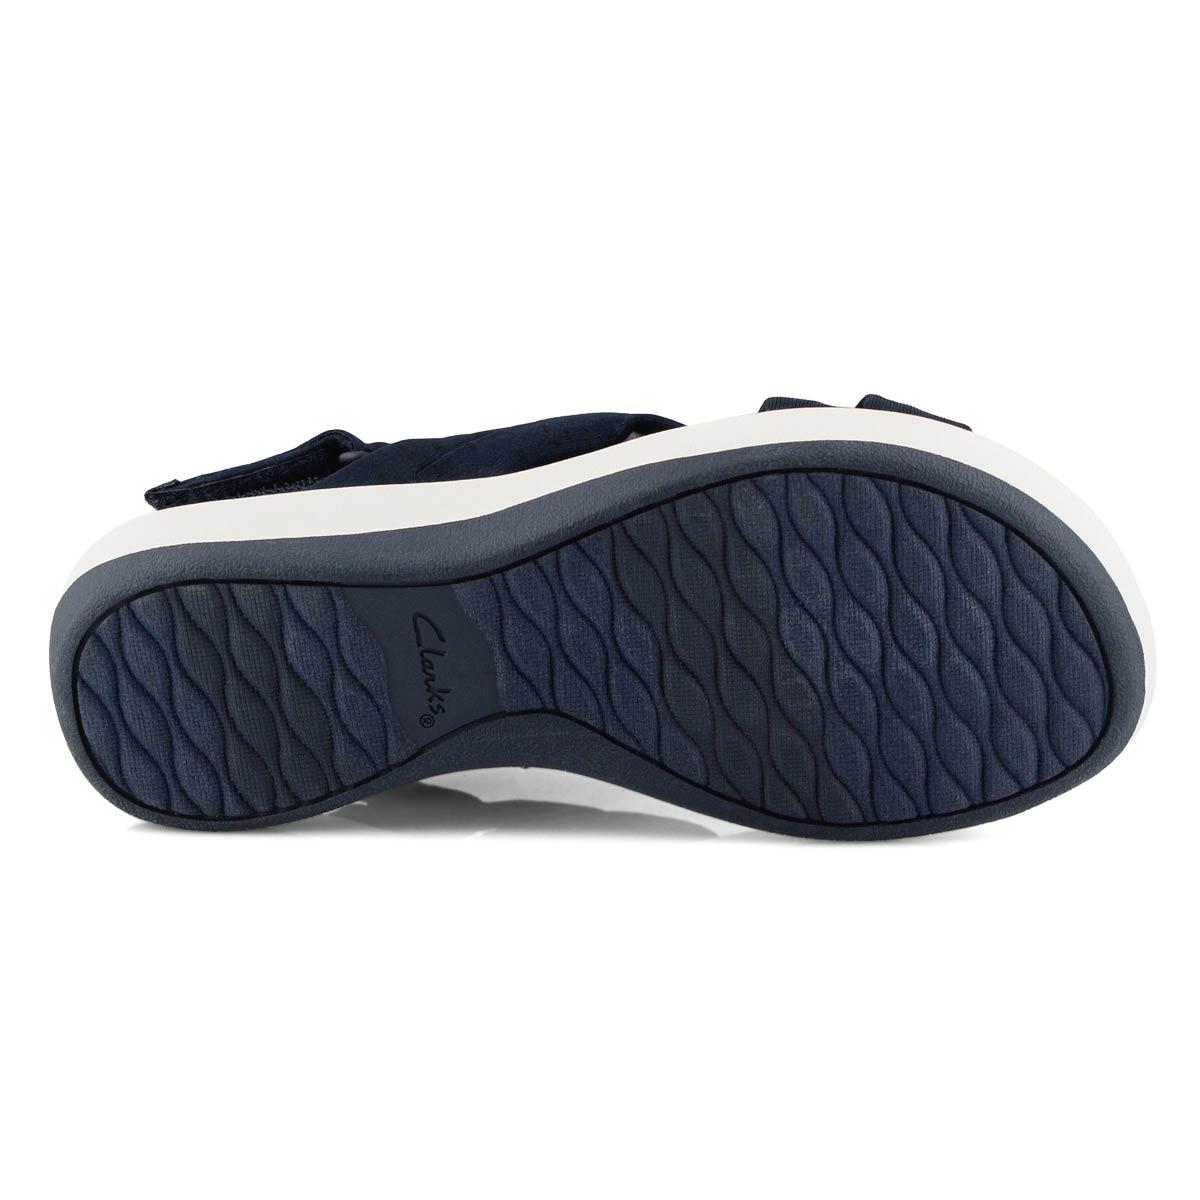 Lds Arla Belle navy casual sandal